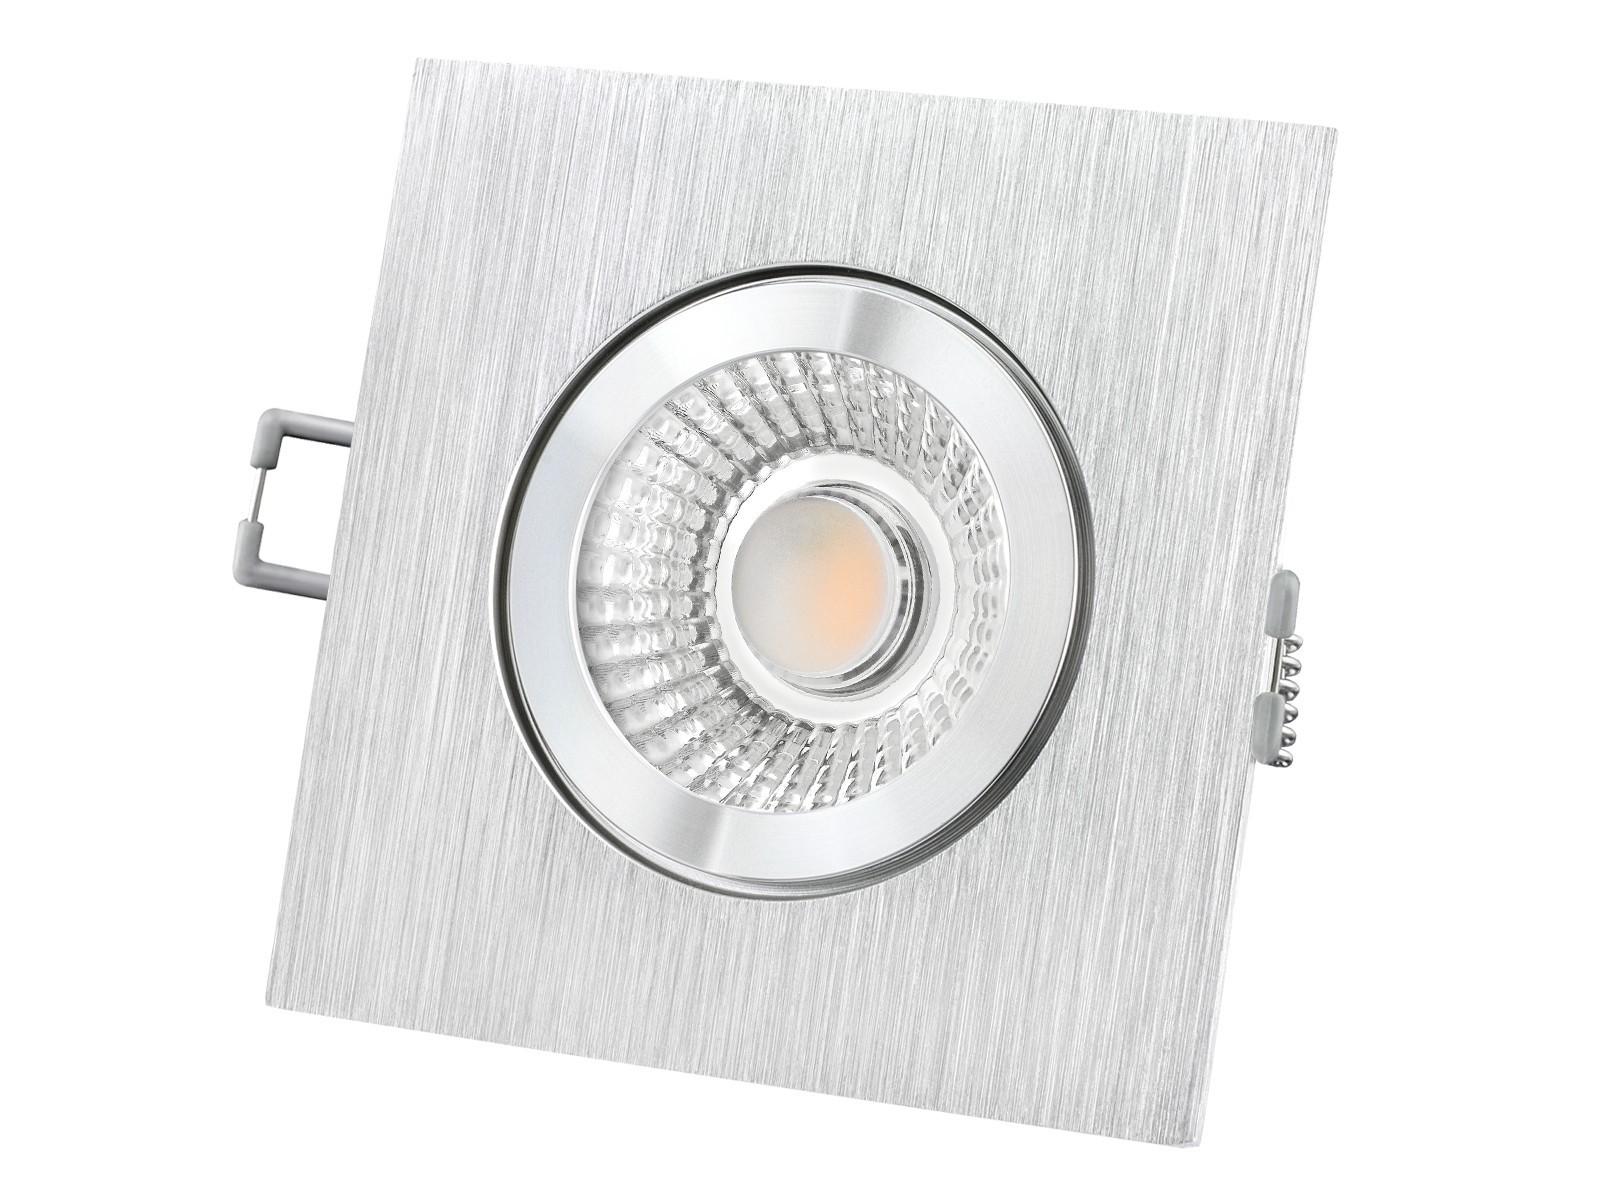 qw 2 led einbauspot quadratisch flach ip44 alu incl led modul 230v 10w warm wei 2300 2700k. Black Bedroom Furniture Sets. Home Design Ideas